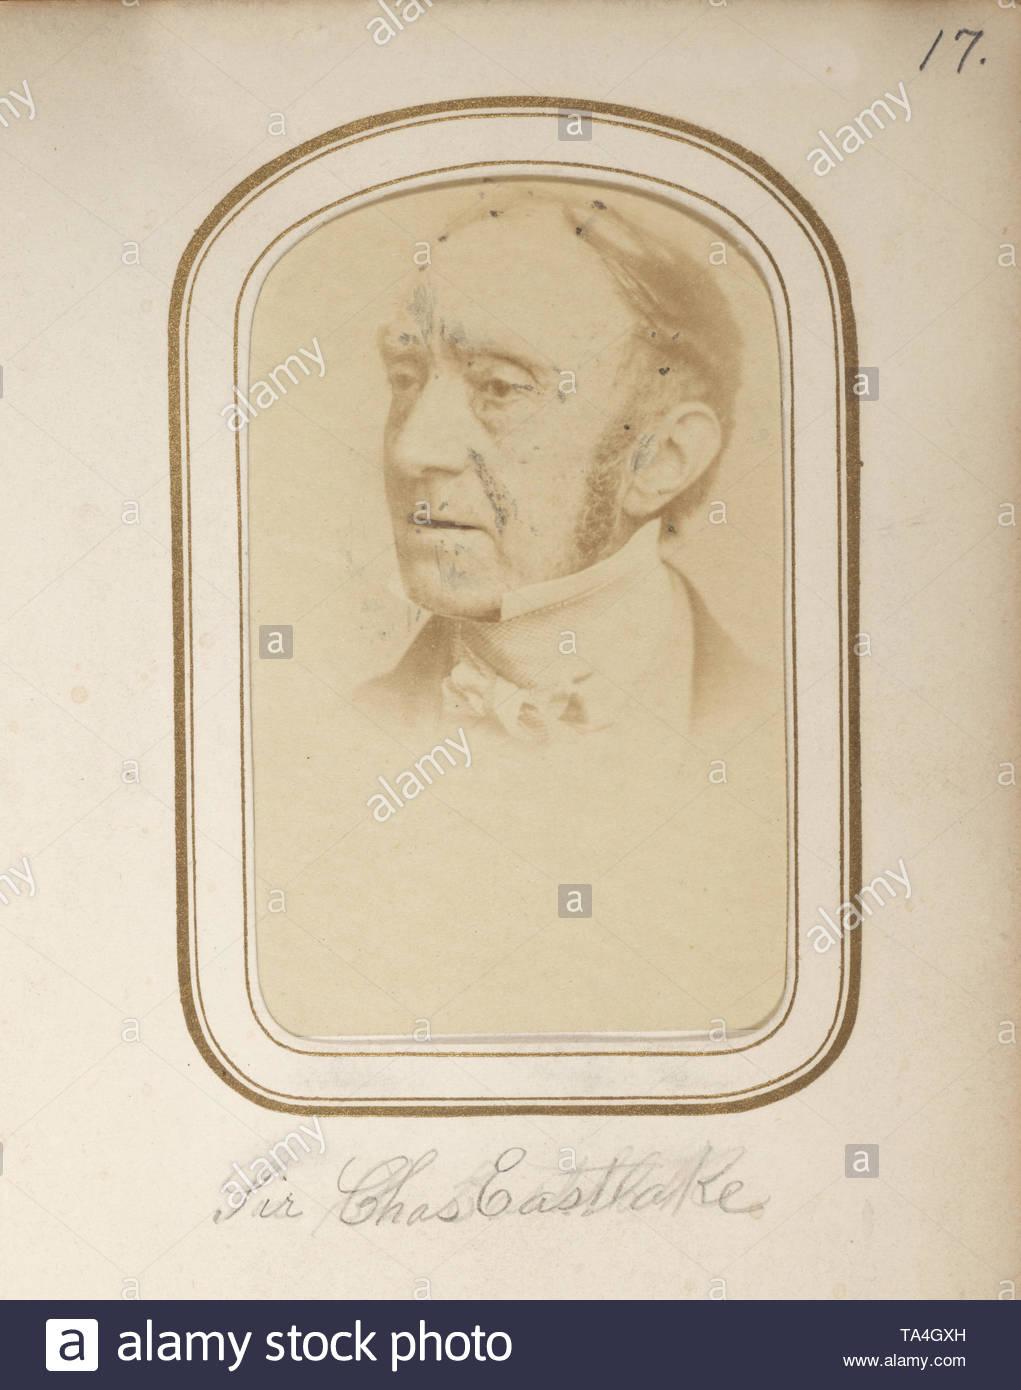 Cartes de visite portraits of nineteenth century artists [graphic]-Sir Charles Lock Eastlake (1793 – 1865) - Stock Image